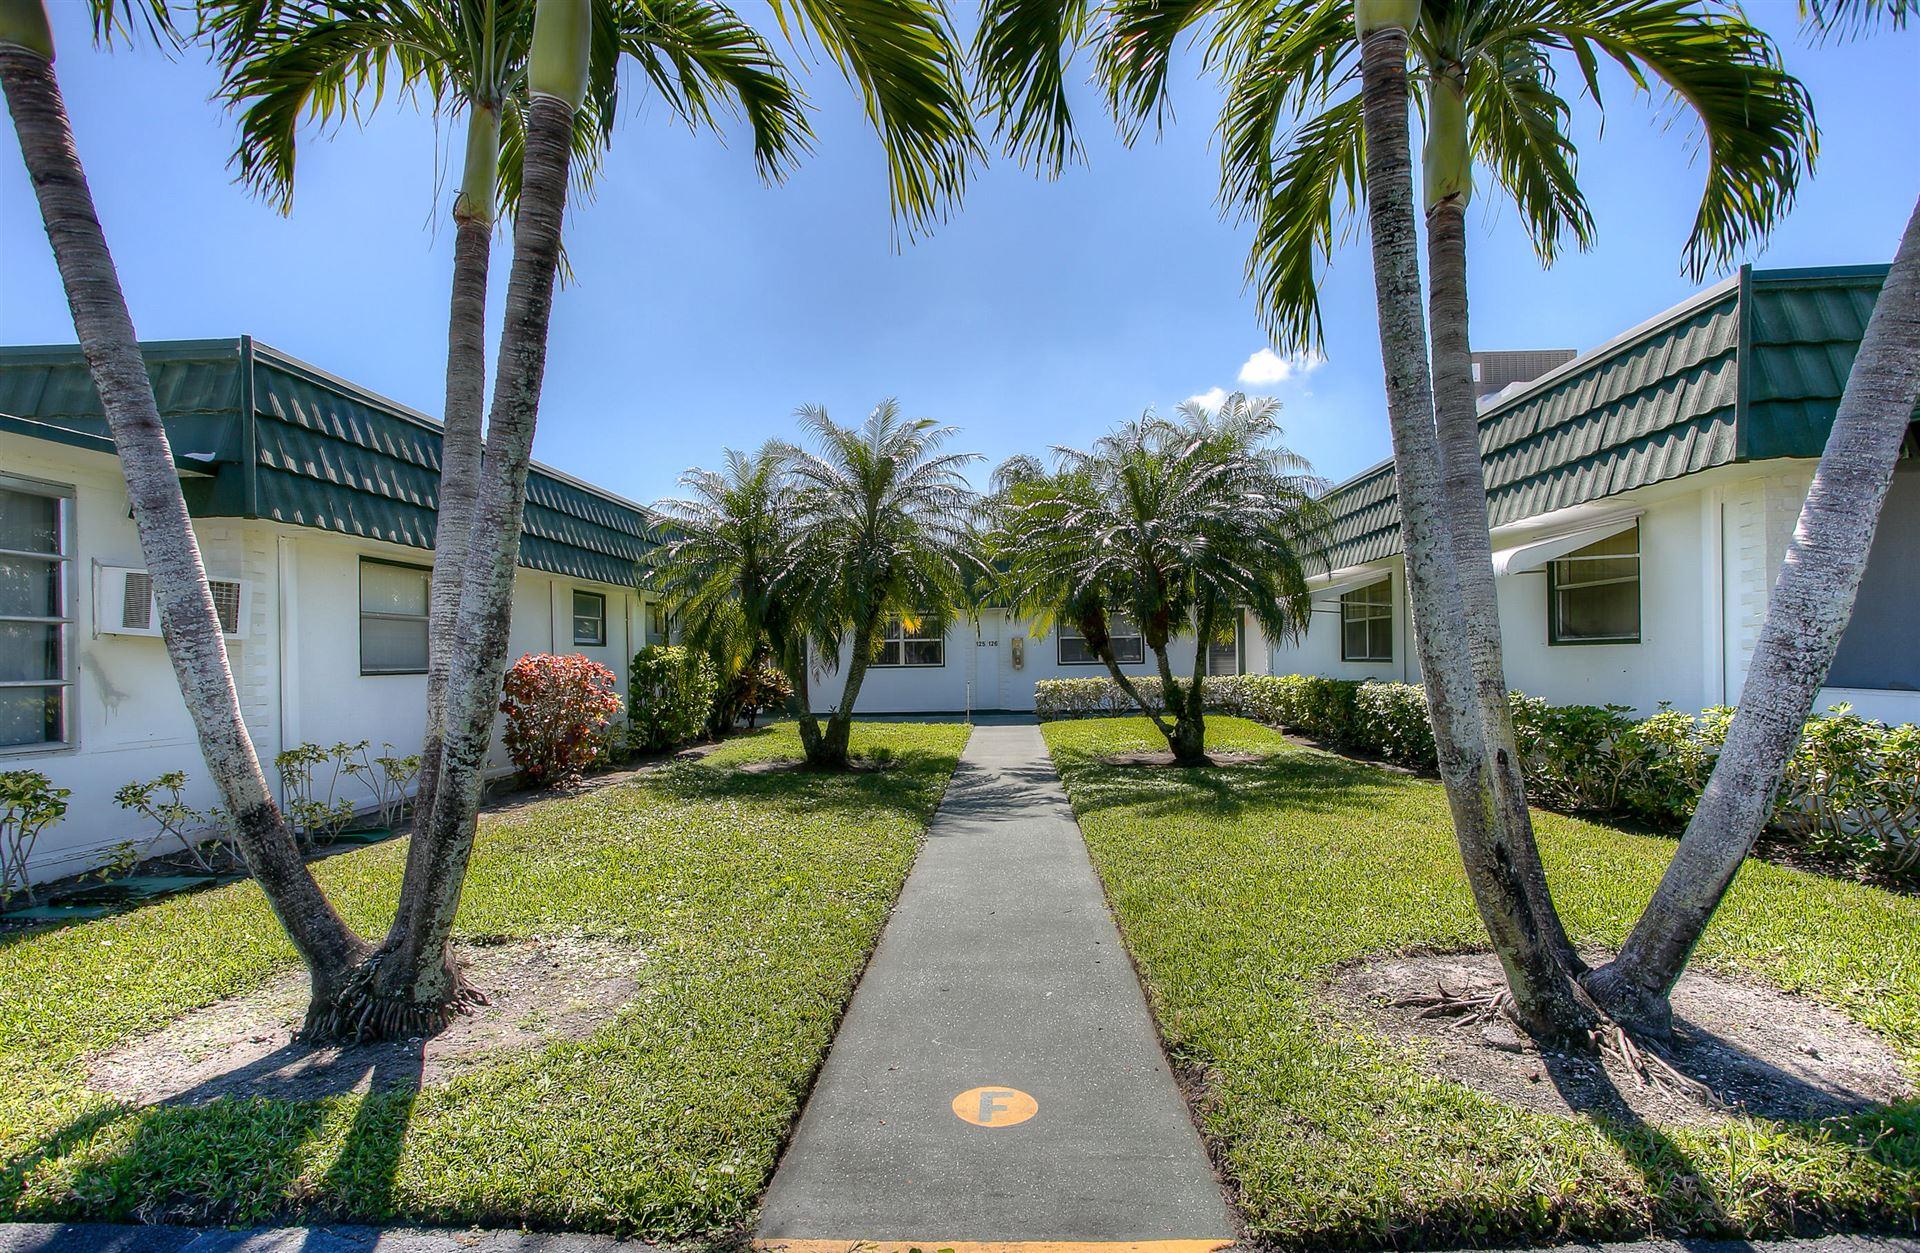 125 Waterford F, Delray Beach, FL 33446 - MLS#: RX-10695811